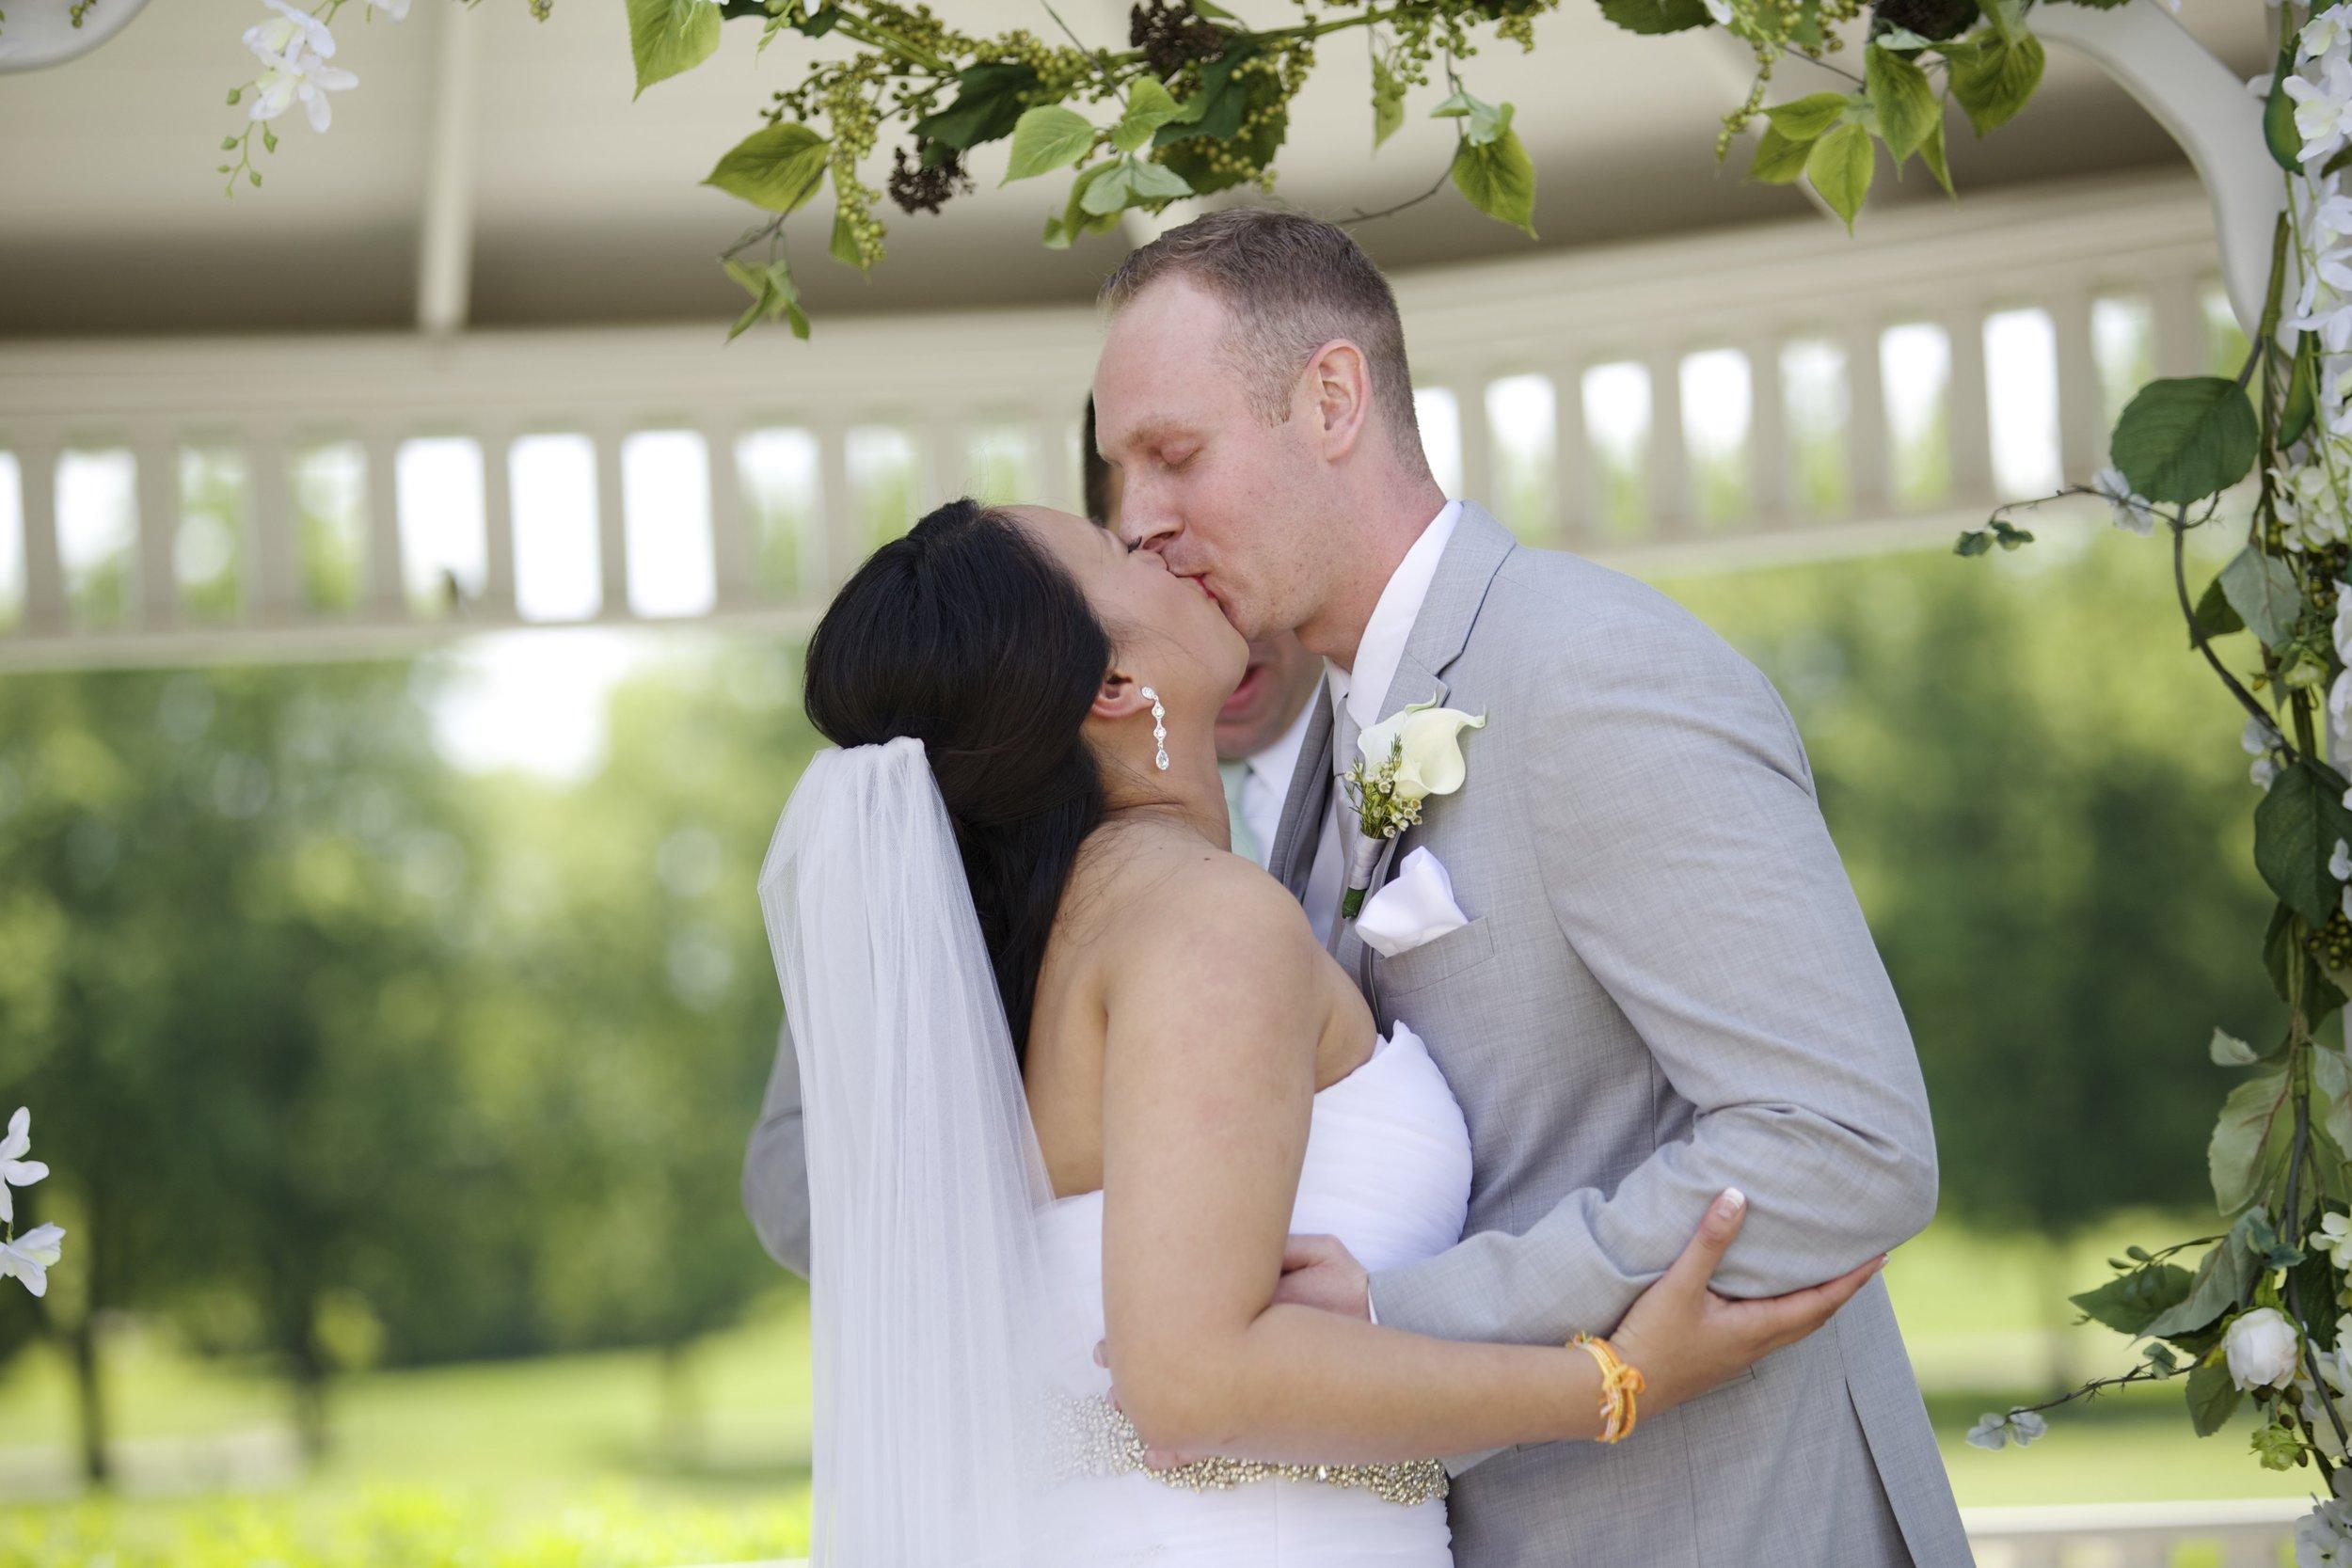 Gray + Mint Laotian Wedding | The Stonegate5.jpg